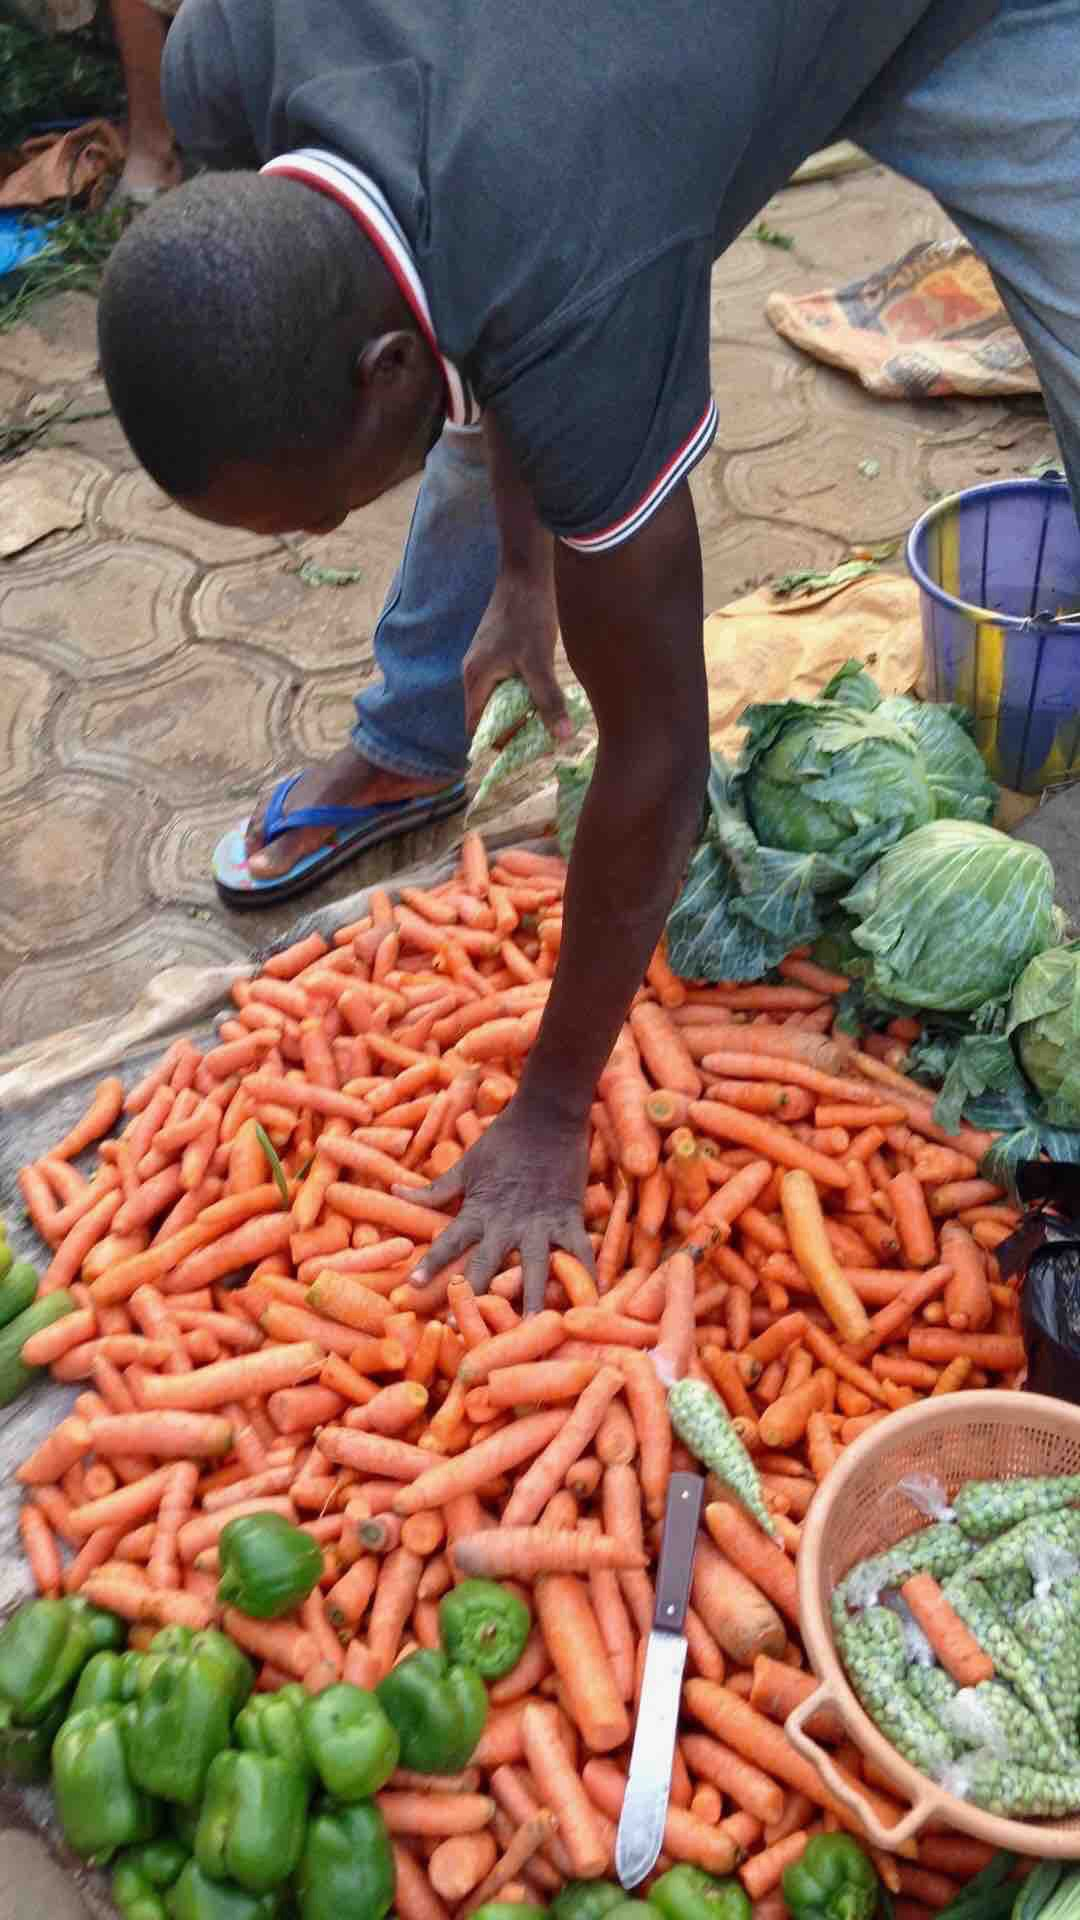 Carrots and cabbage, Dutse Market, Dutse, Nigeria. #JujuFilms